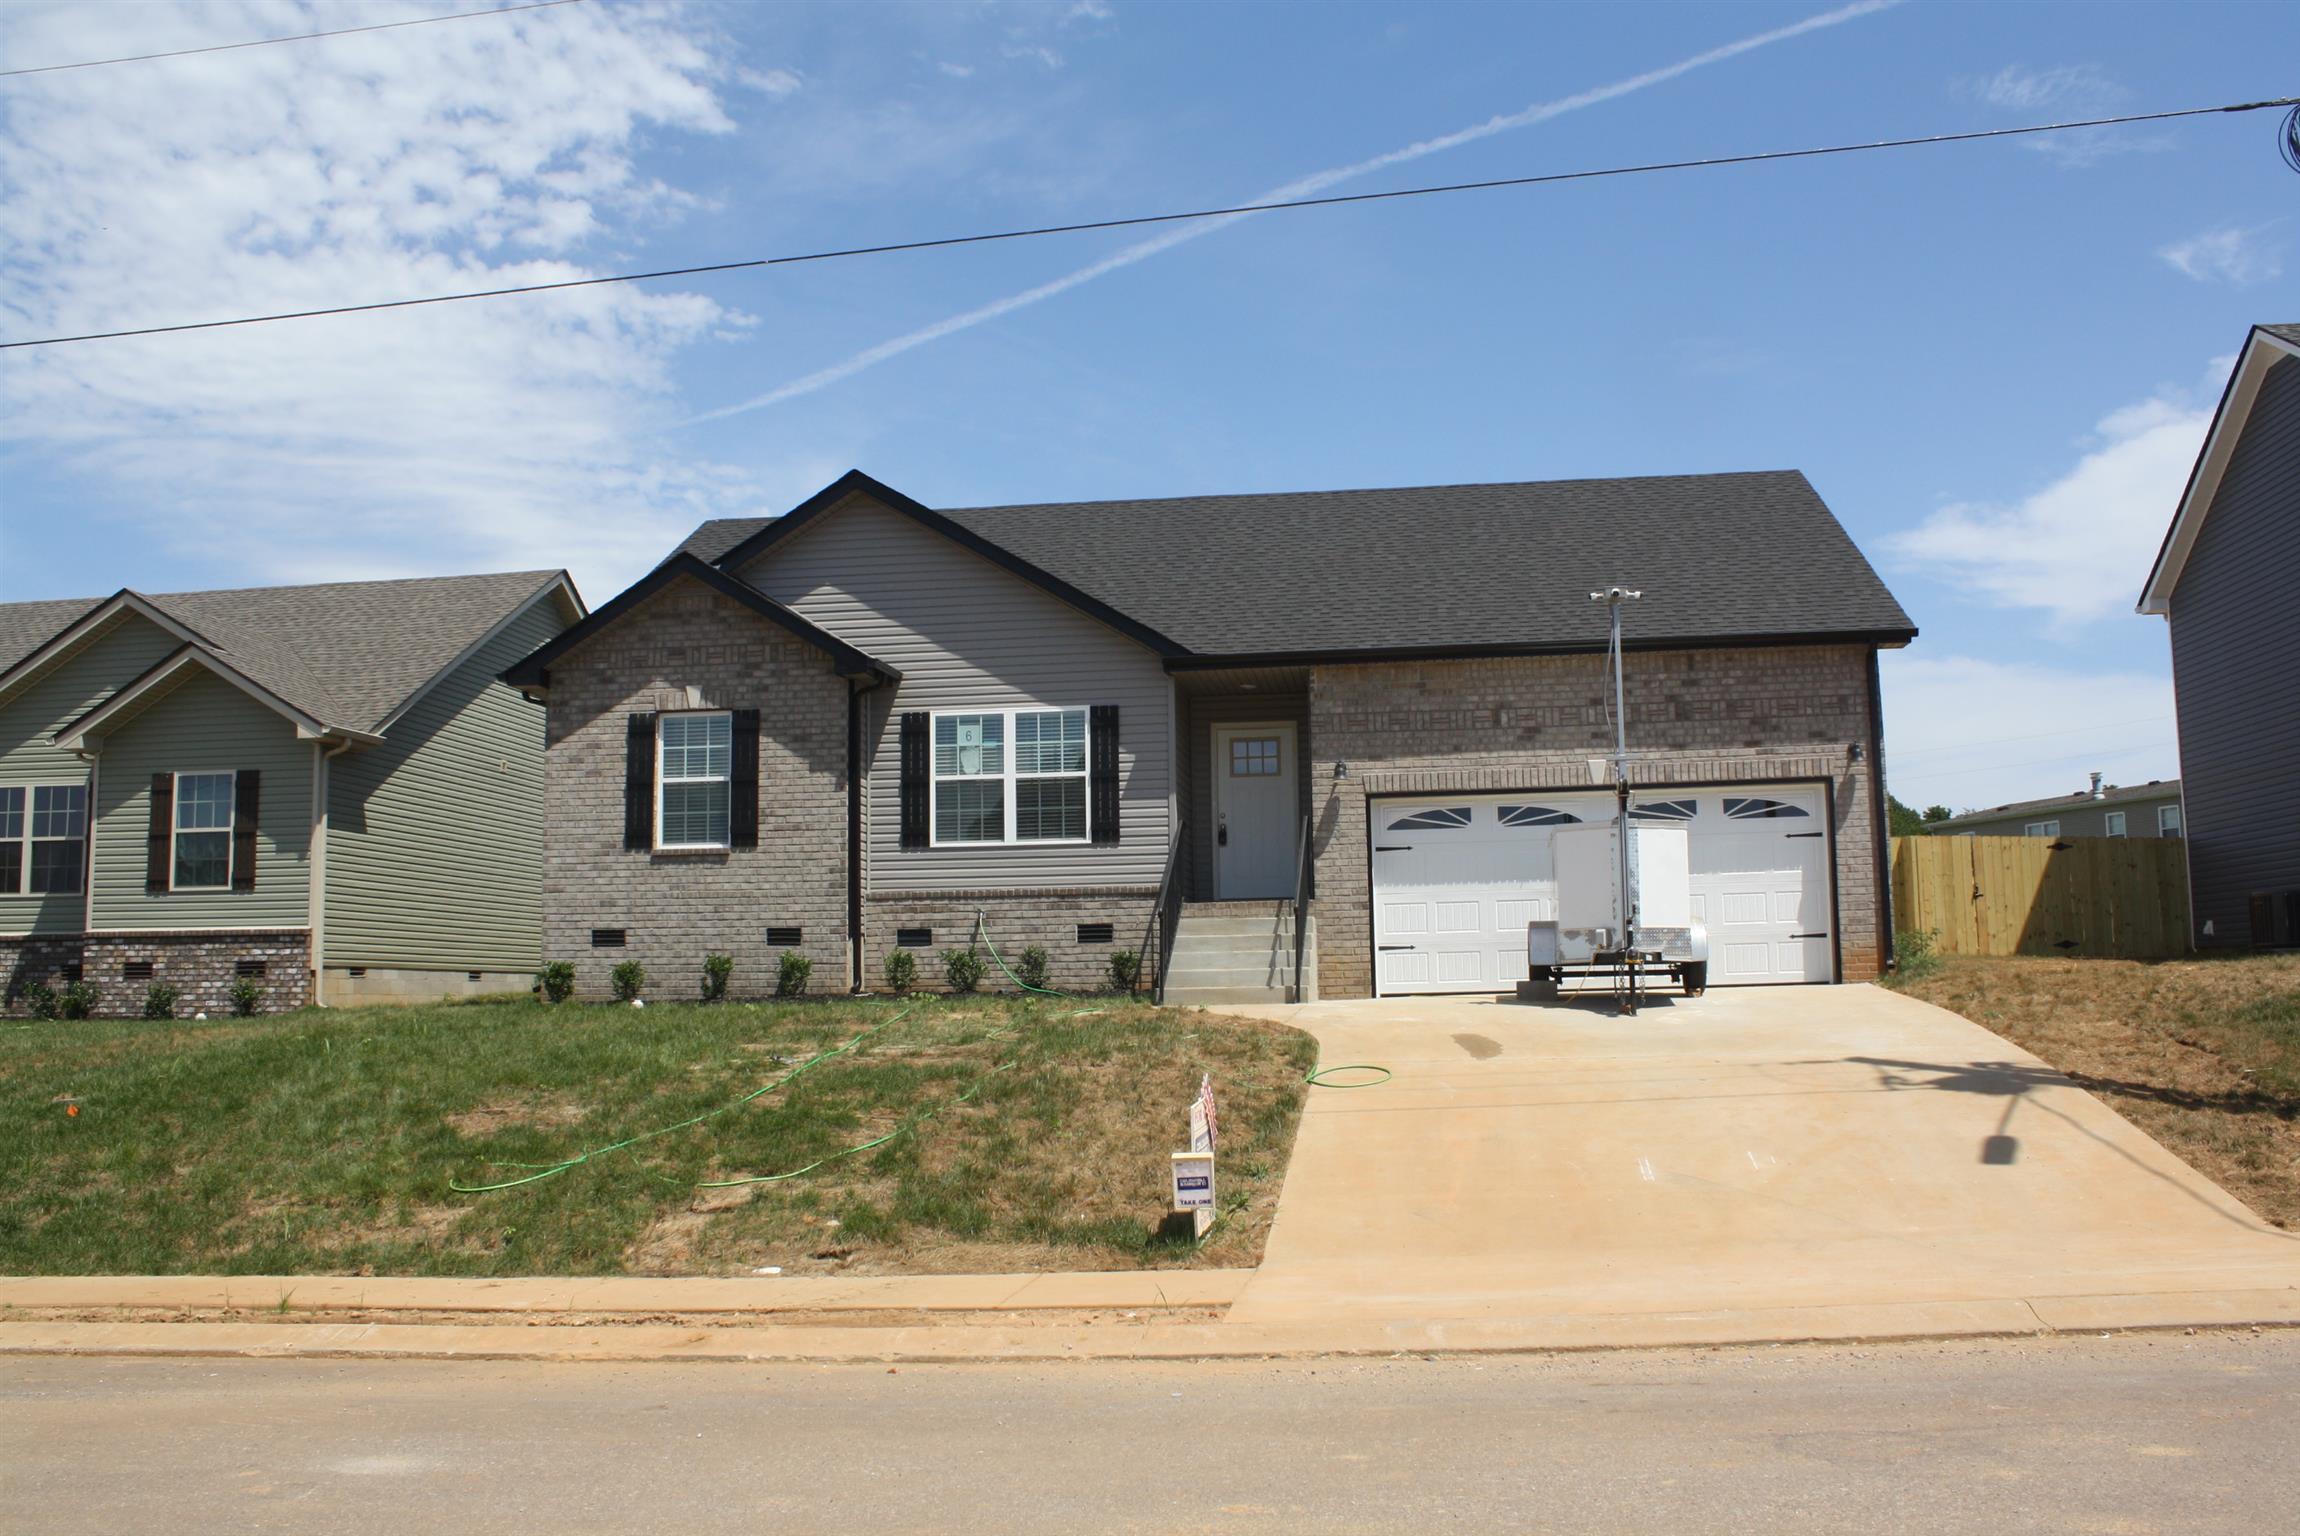 6 Rose Edd Estates, Oak Grove, KY 42262 - Oak Grove, KY real estate listing